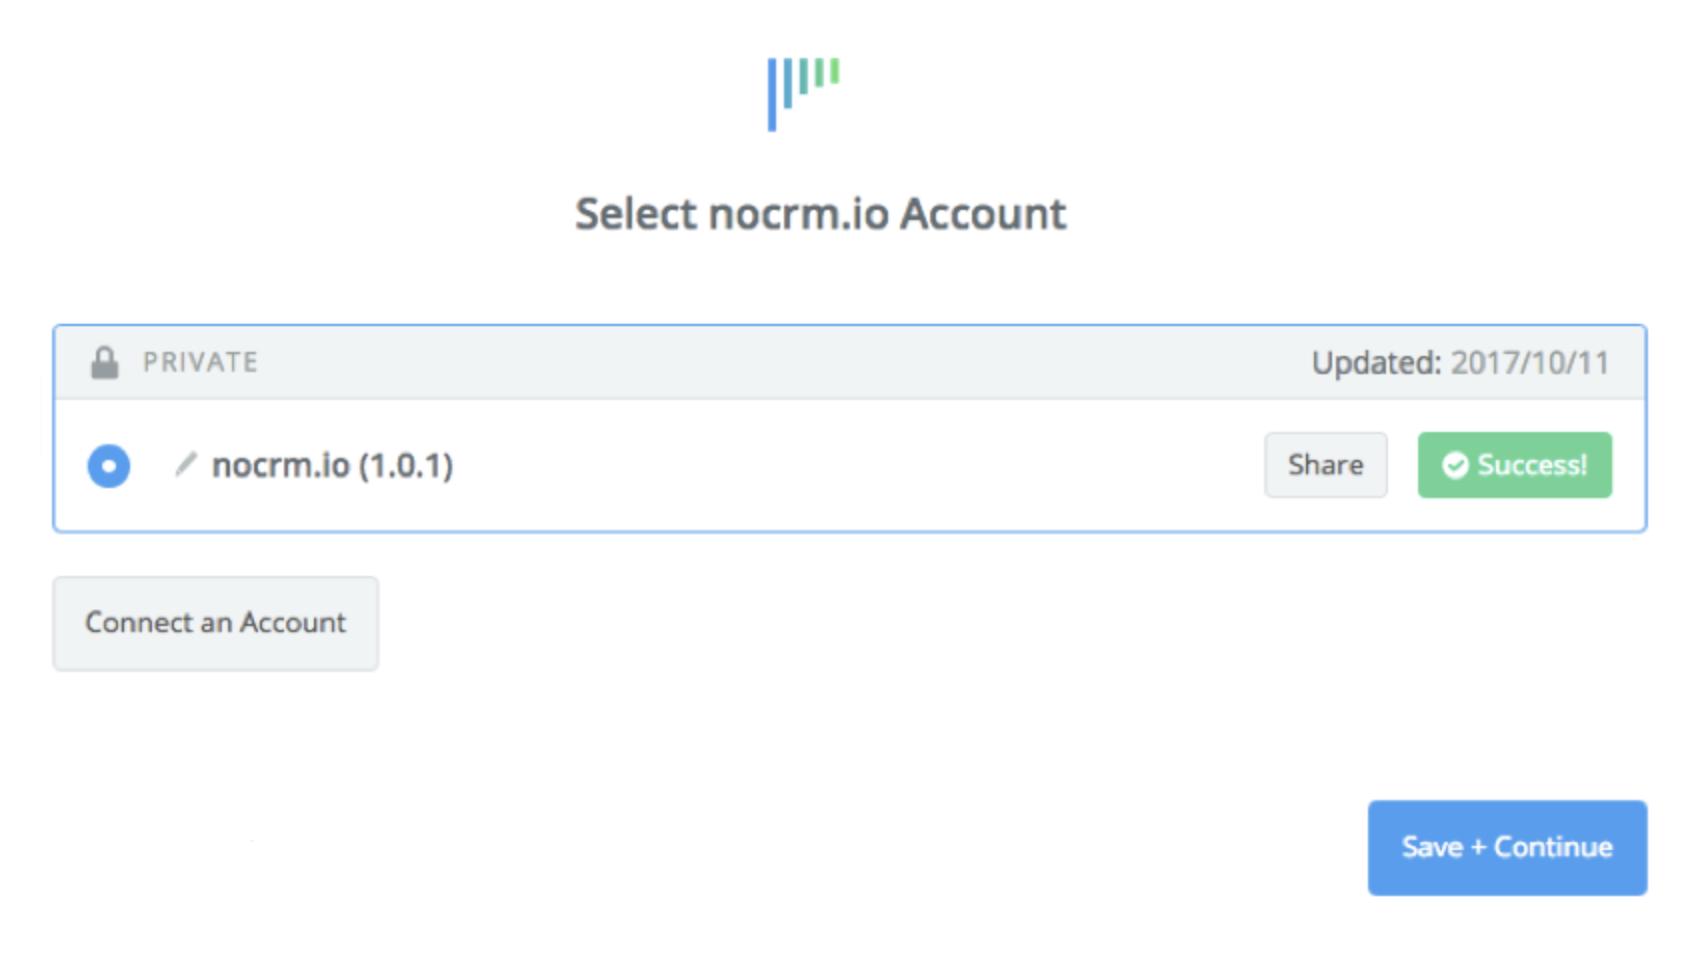 noCRM.io connection successfull